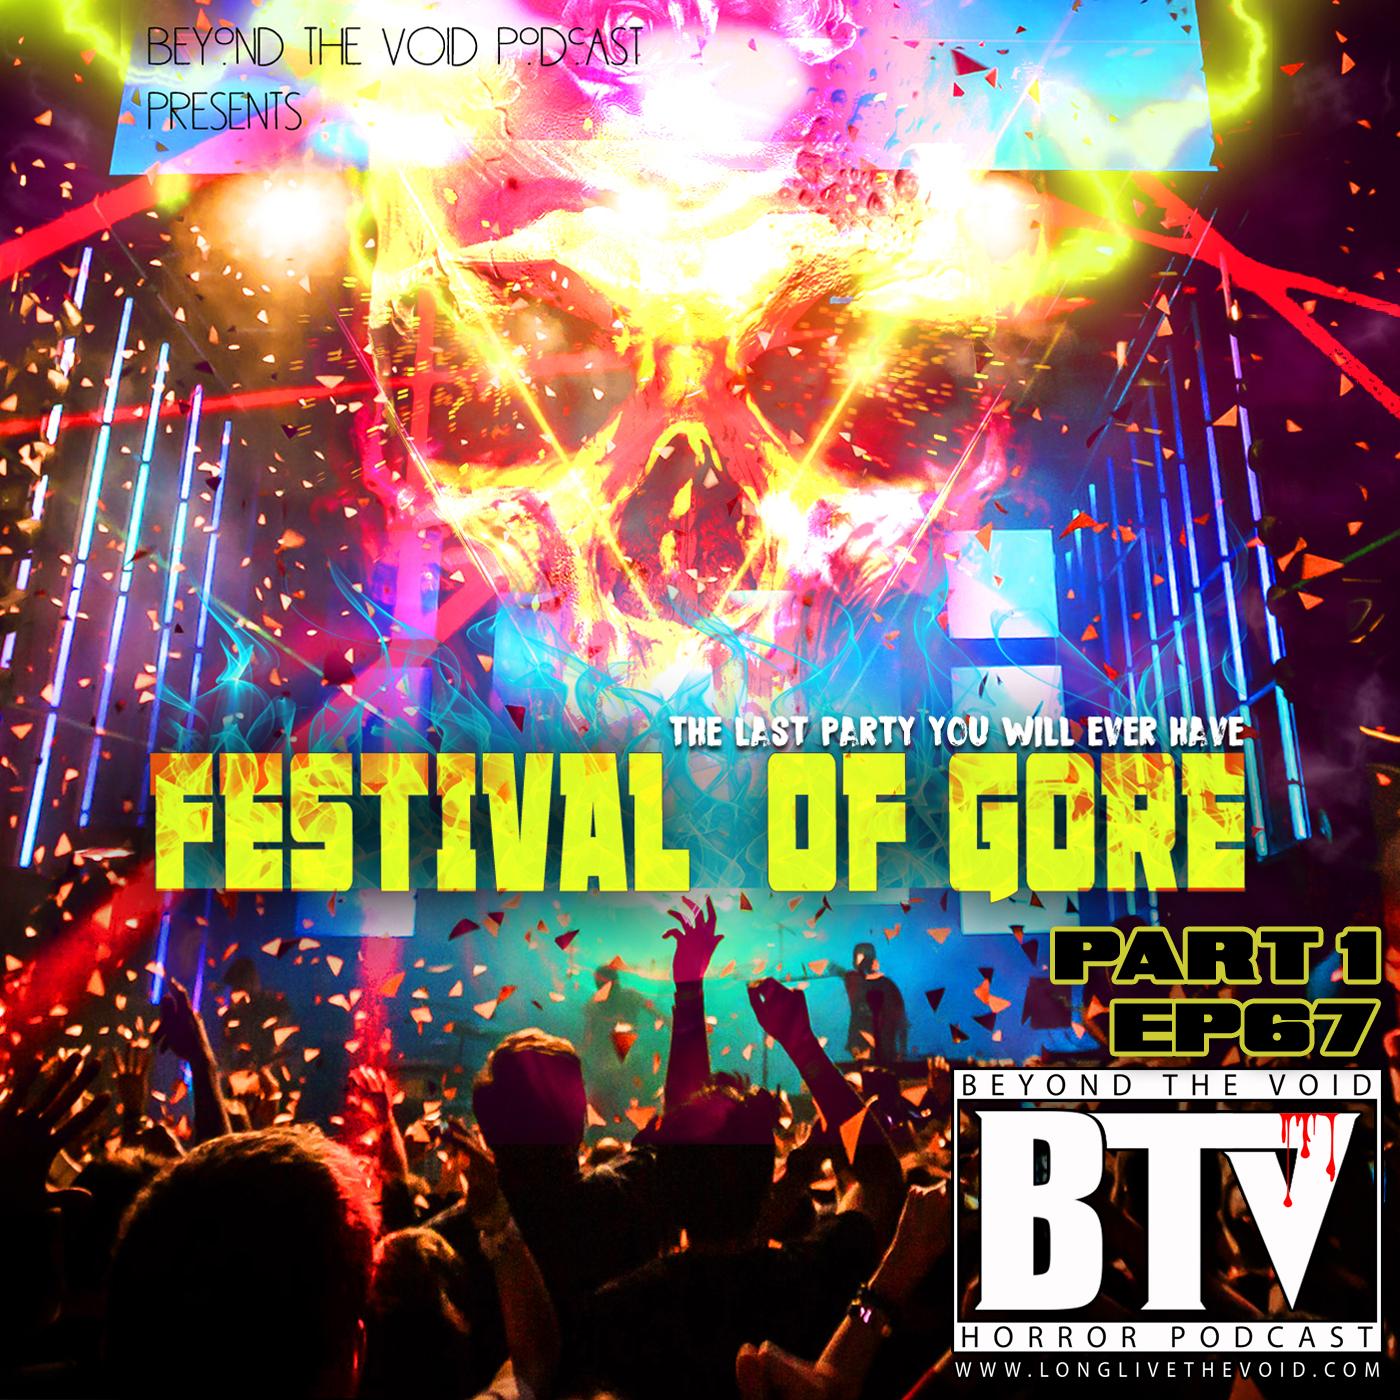 FINAL-14x14-Fest-of-gore.jpg